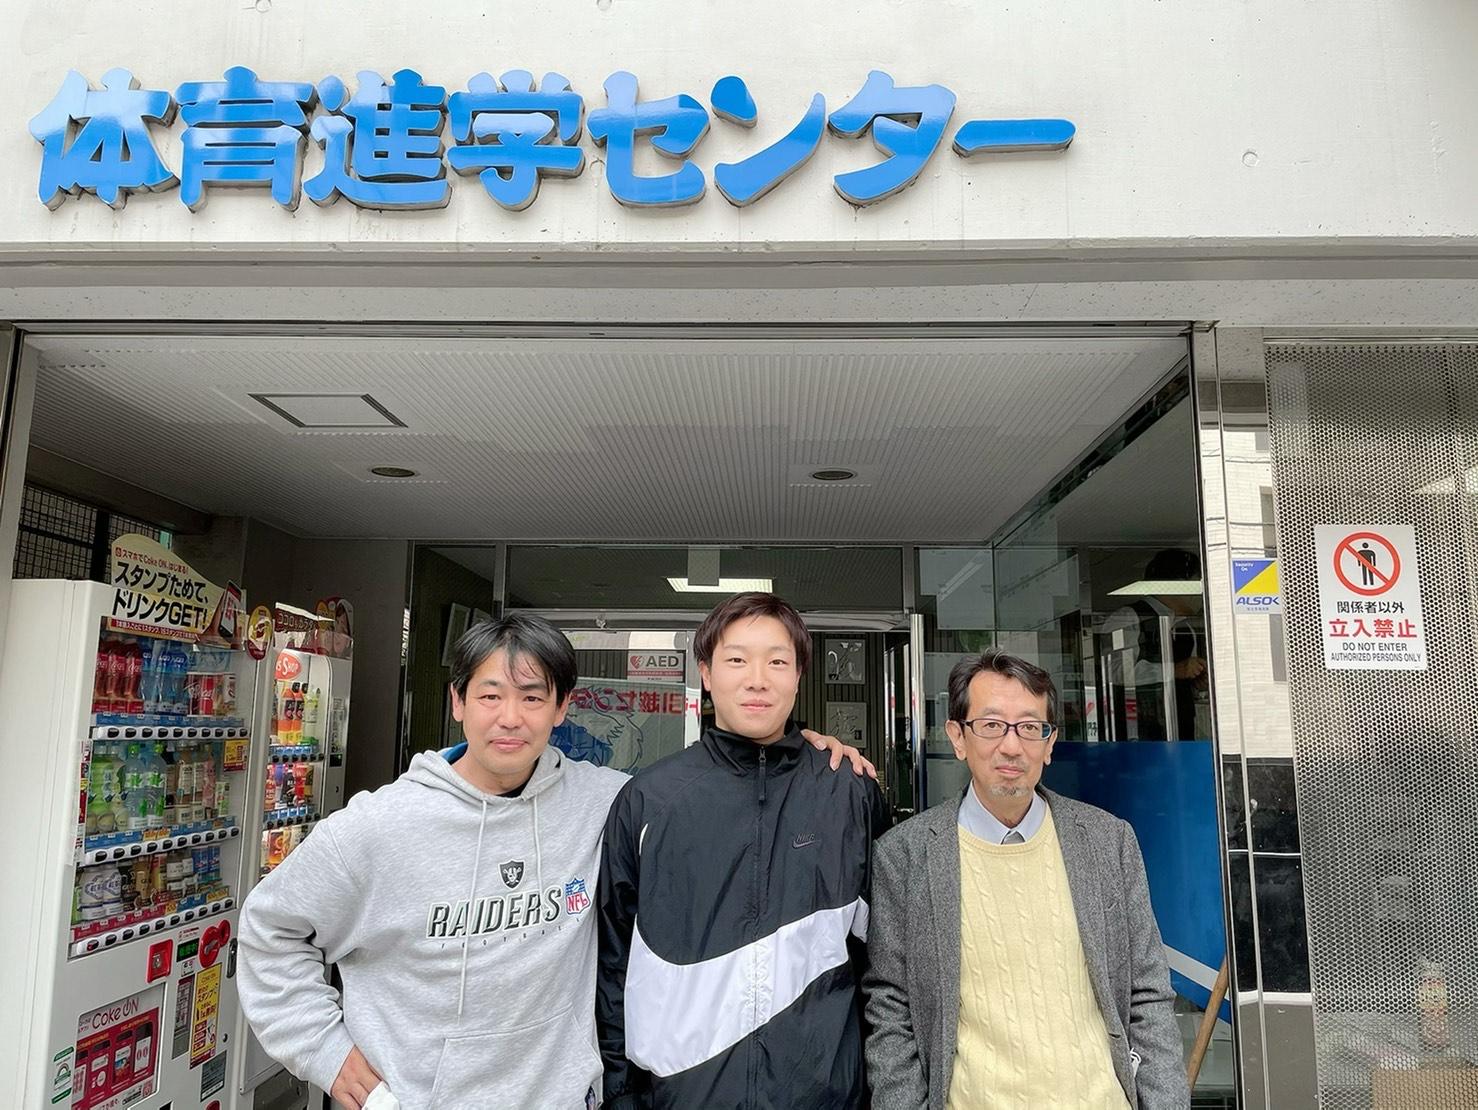 http://www.e-taishin.com/diary/img/1_3_20210315_mizu.jpg